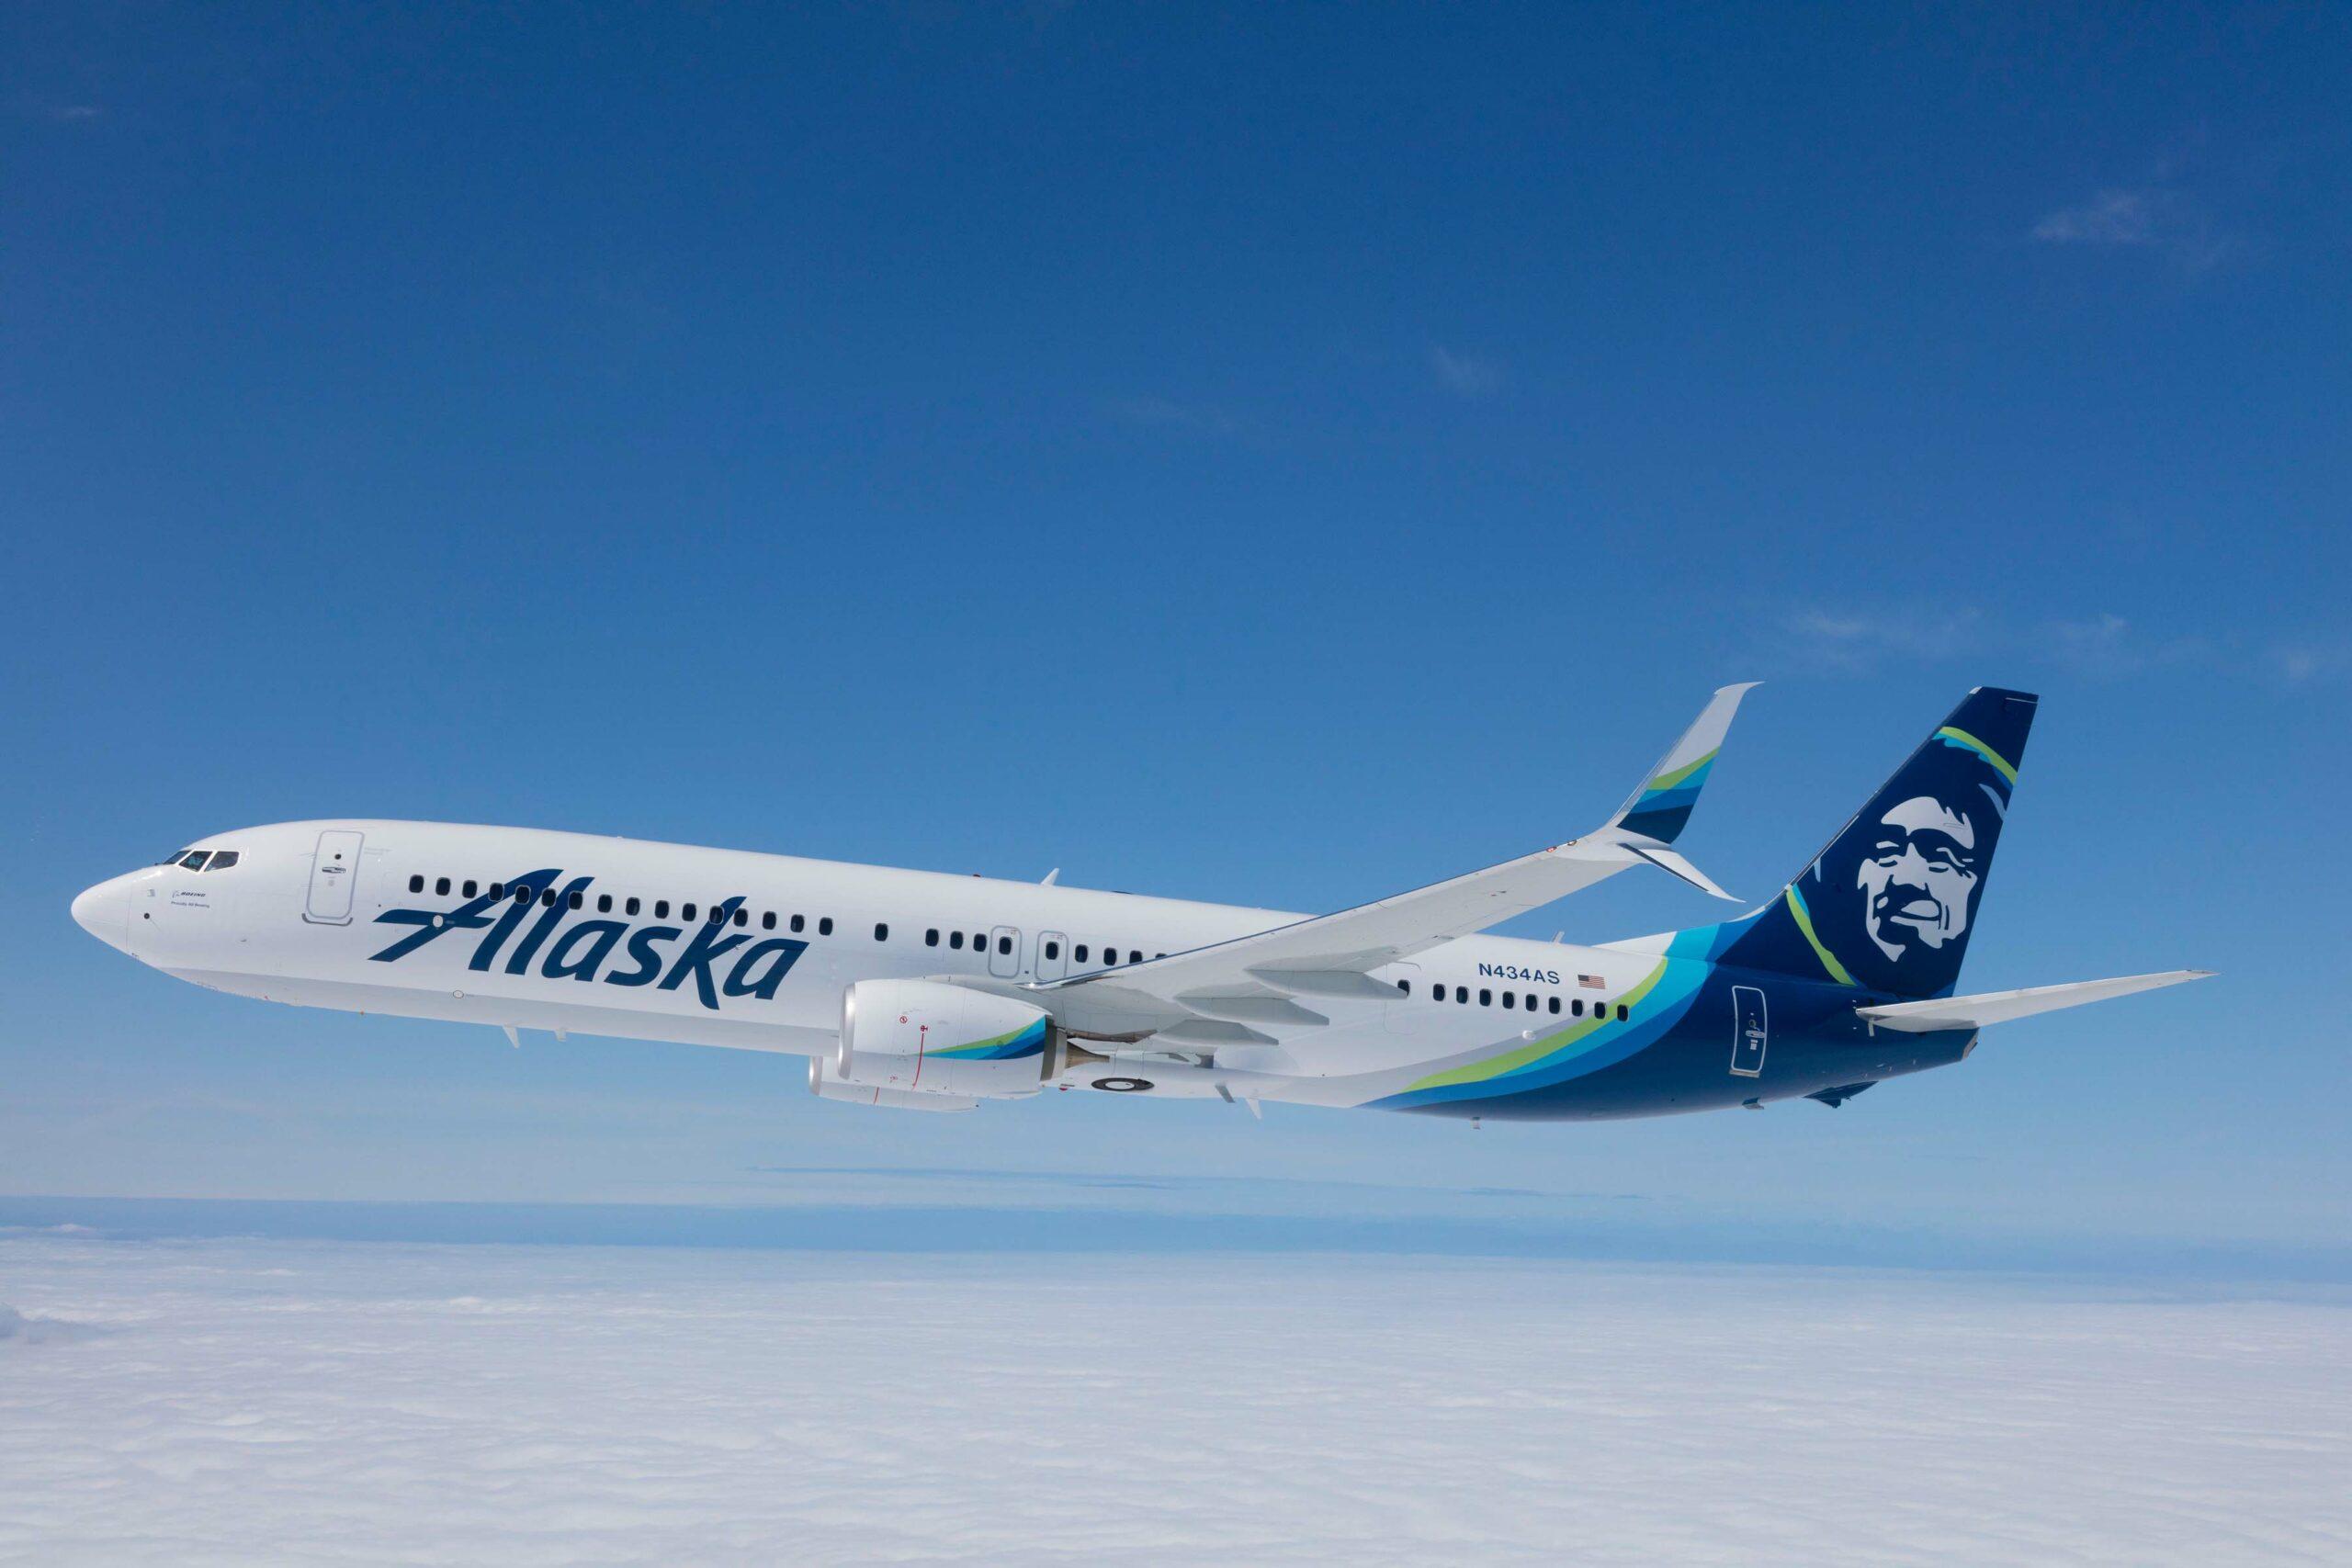 3.Alaska Airline